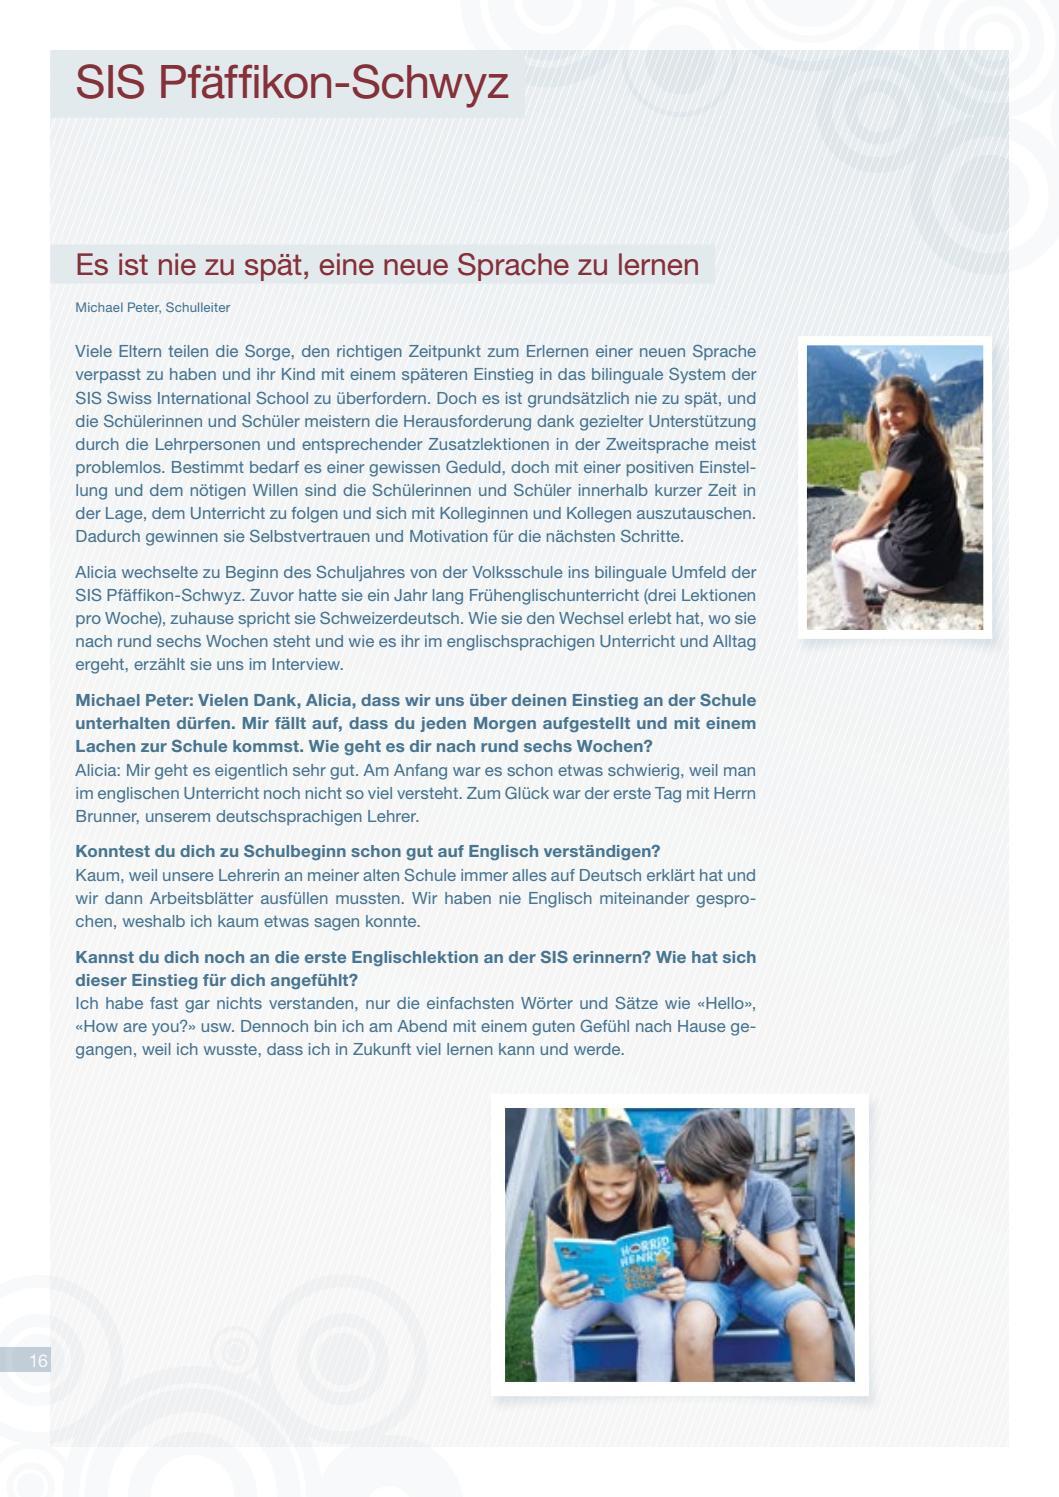 SIS News Autumn 2016 by SIS Swiss International School Schweiz - issuu